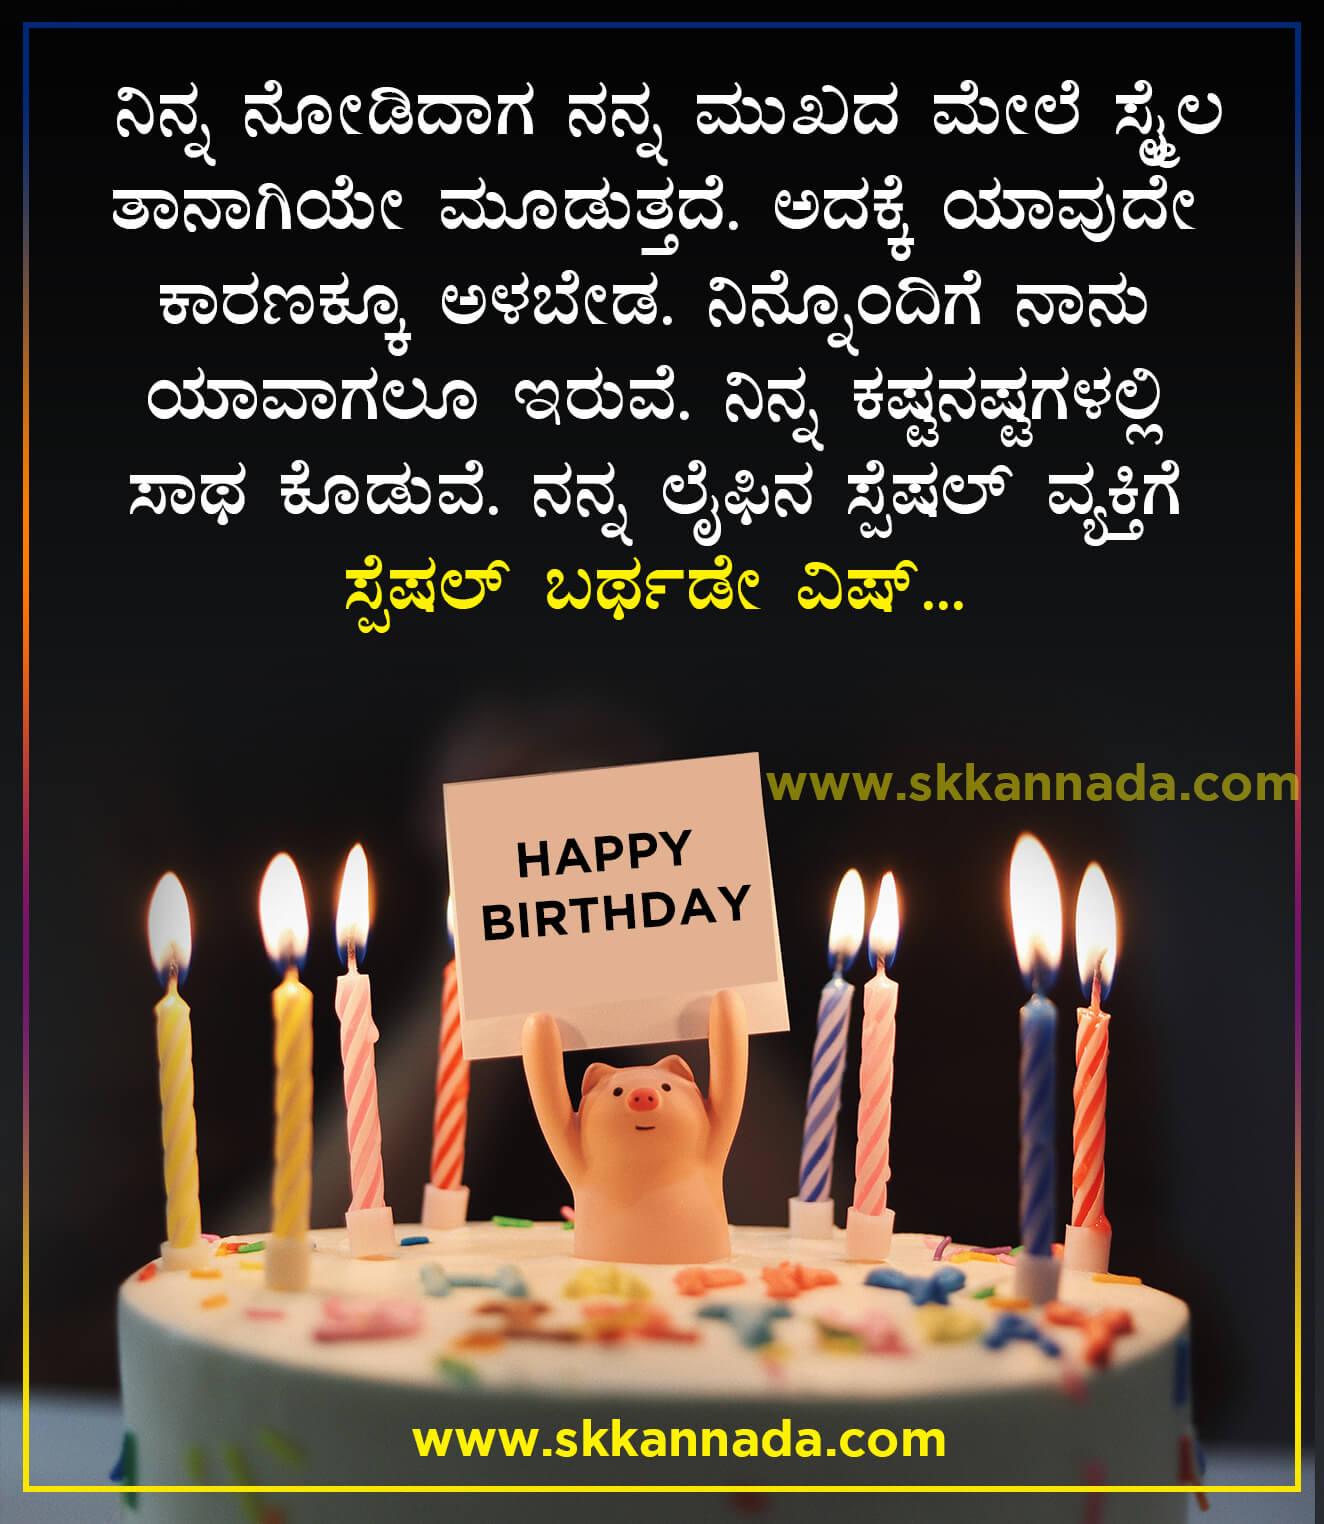 Happy Birthday Wishes in Kannada